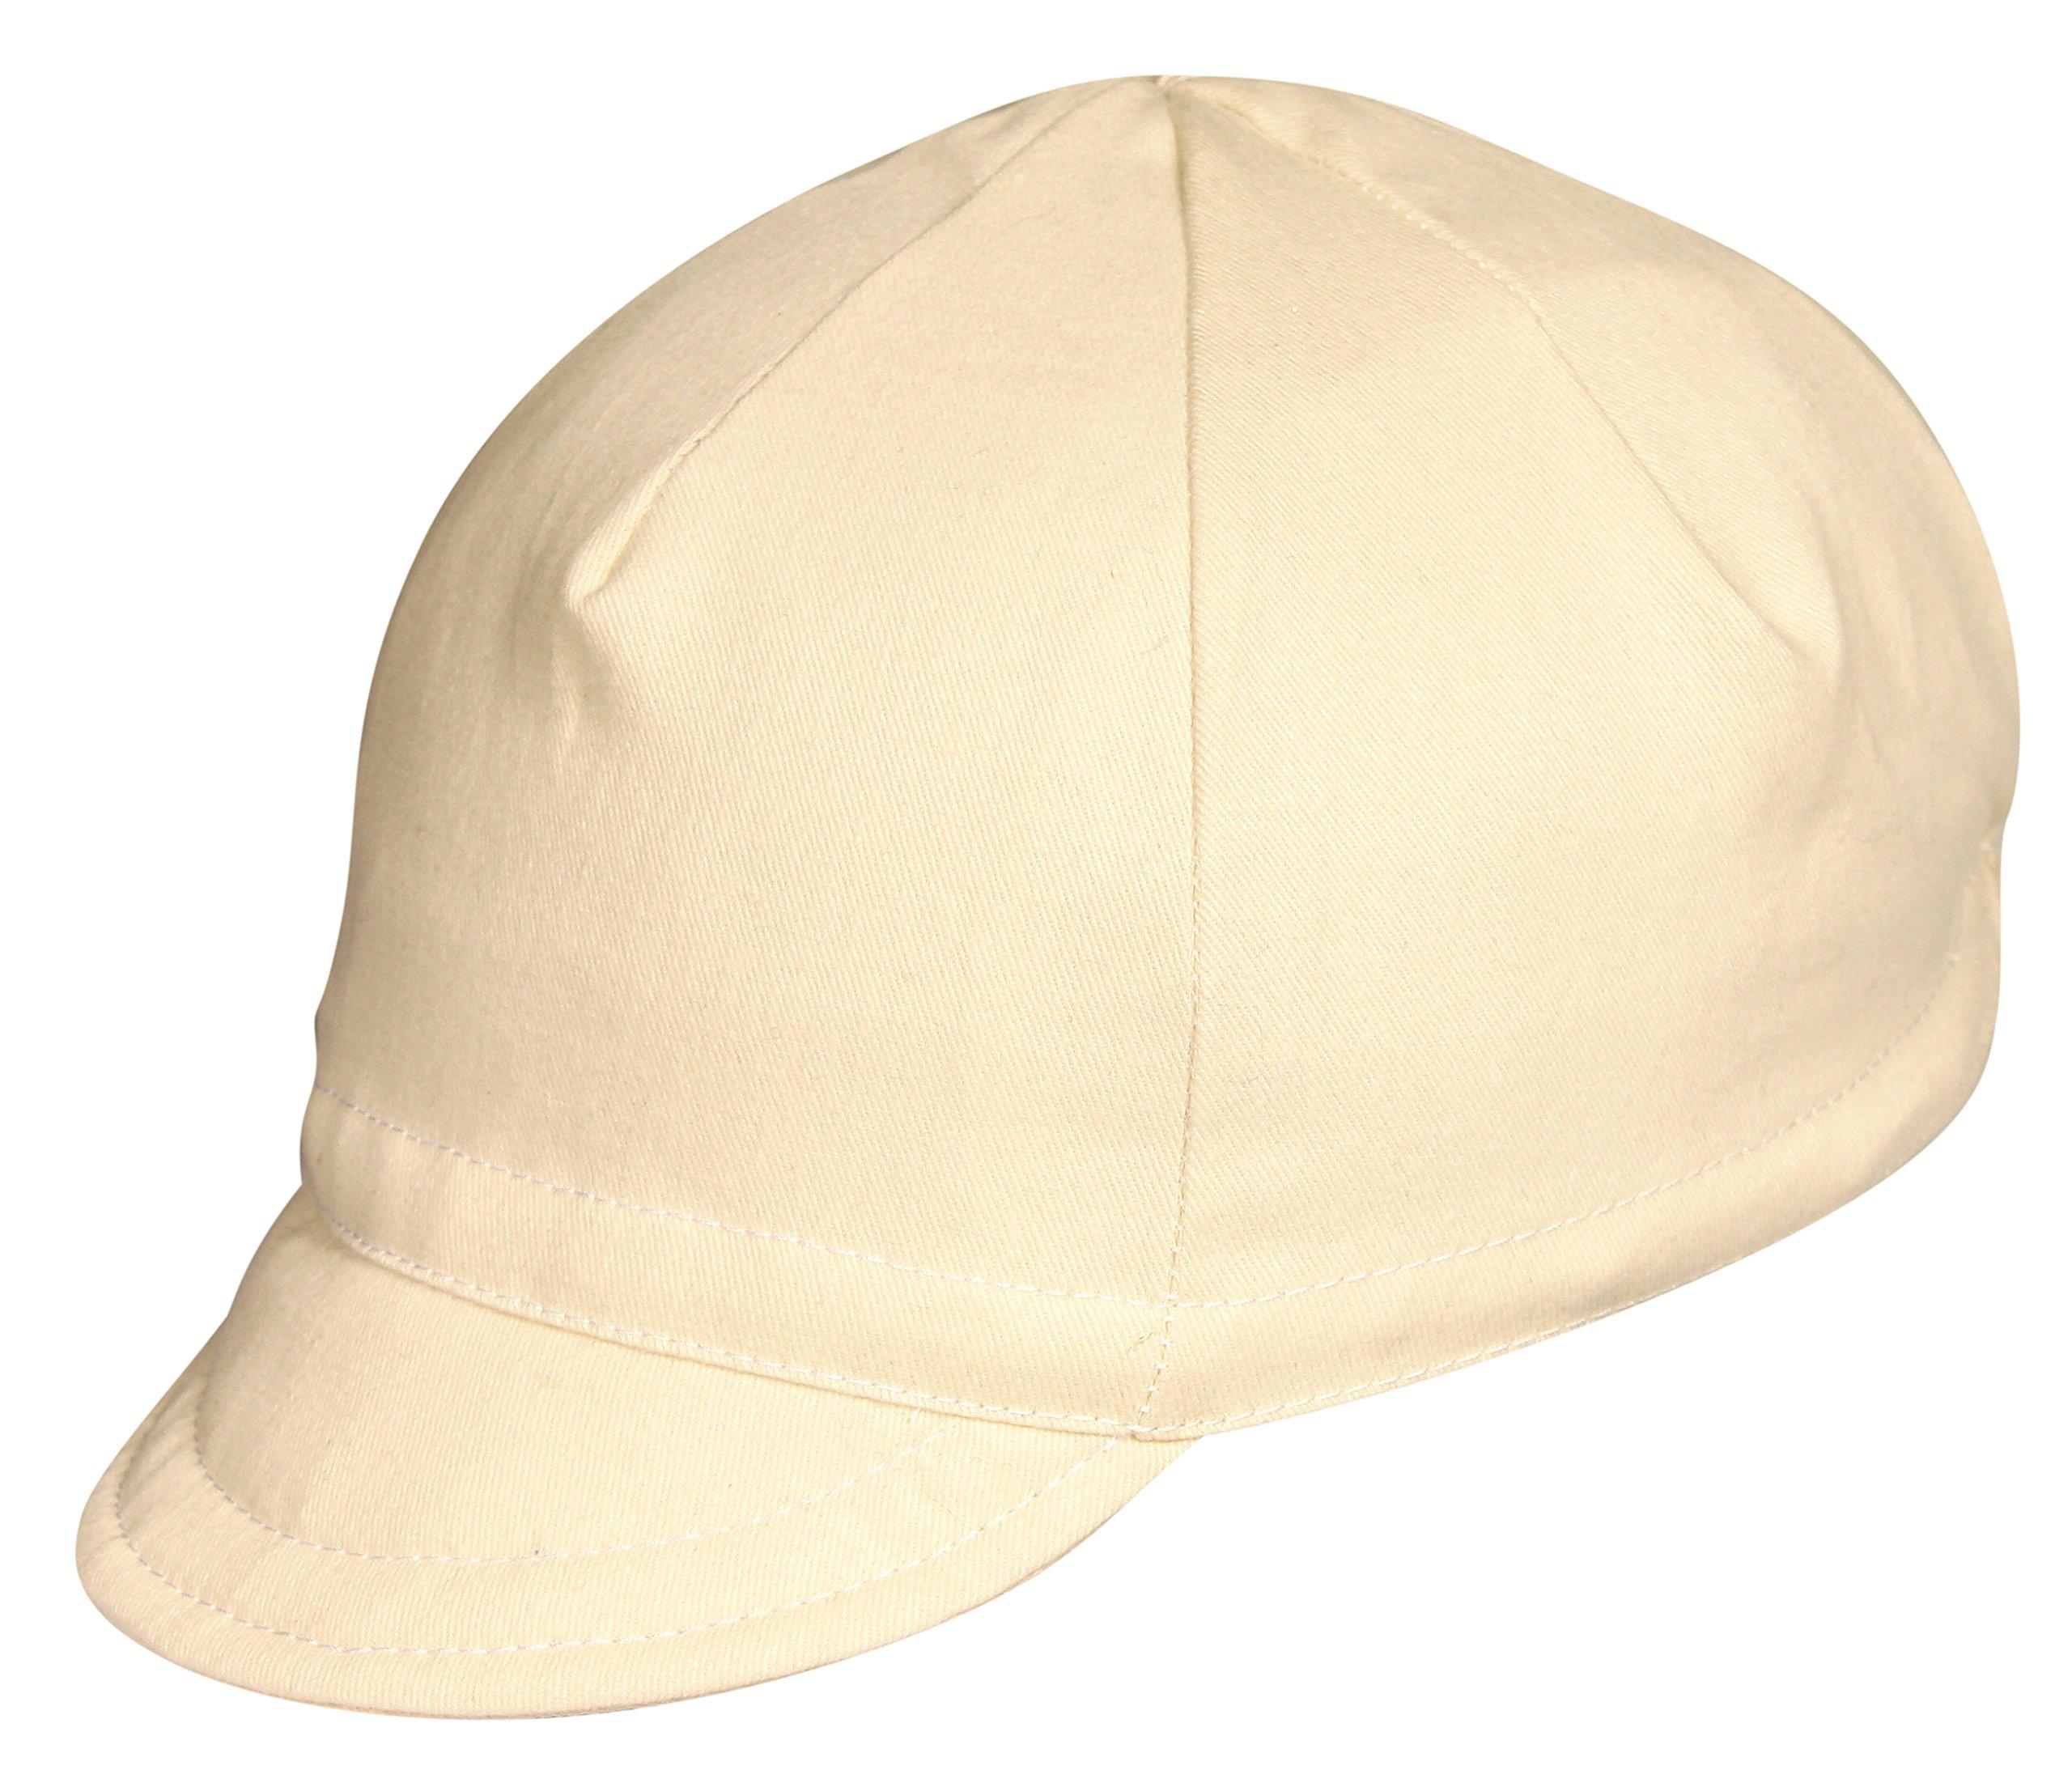 Pace Sportswear Euro Brushed Twill Vanilla Cap by Pace Sportswear (Image #1)